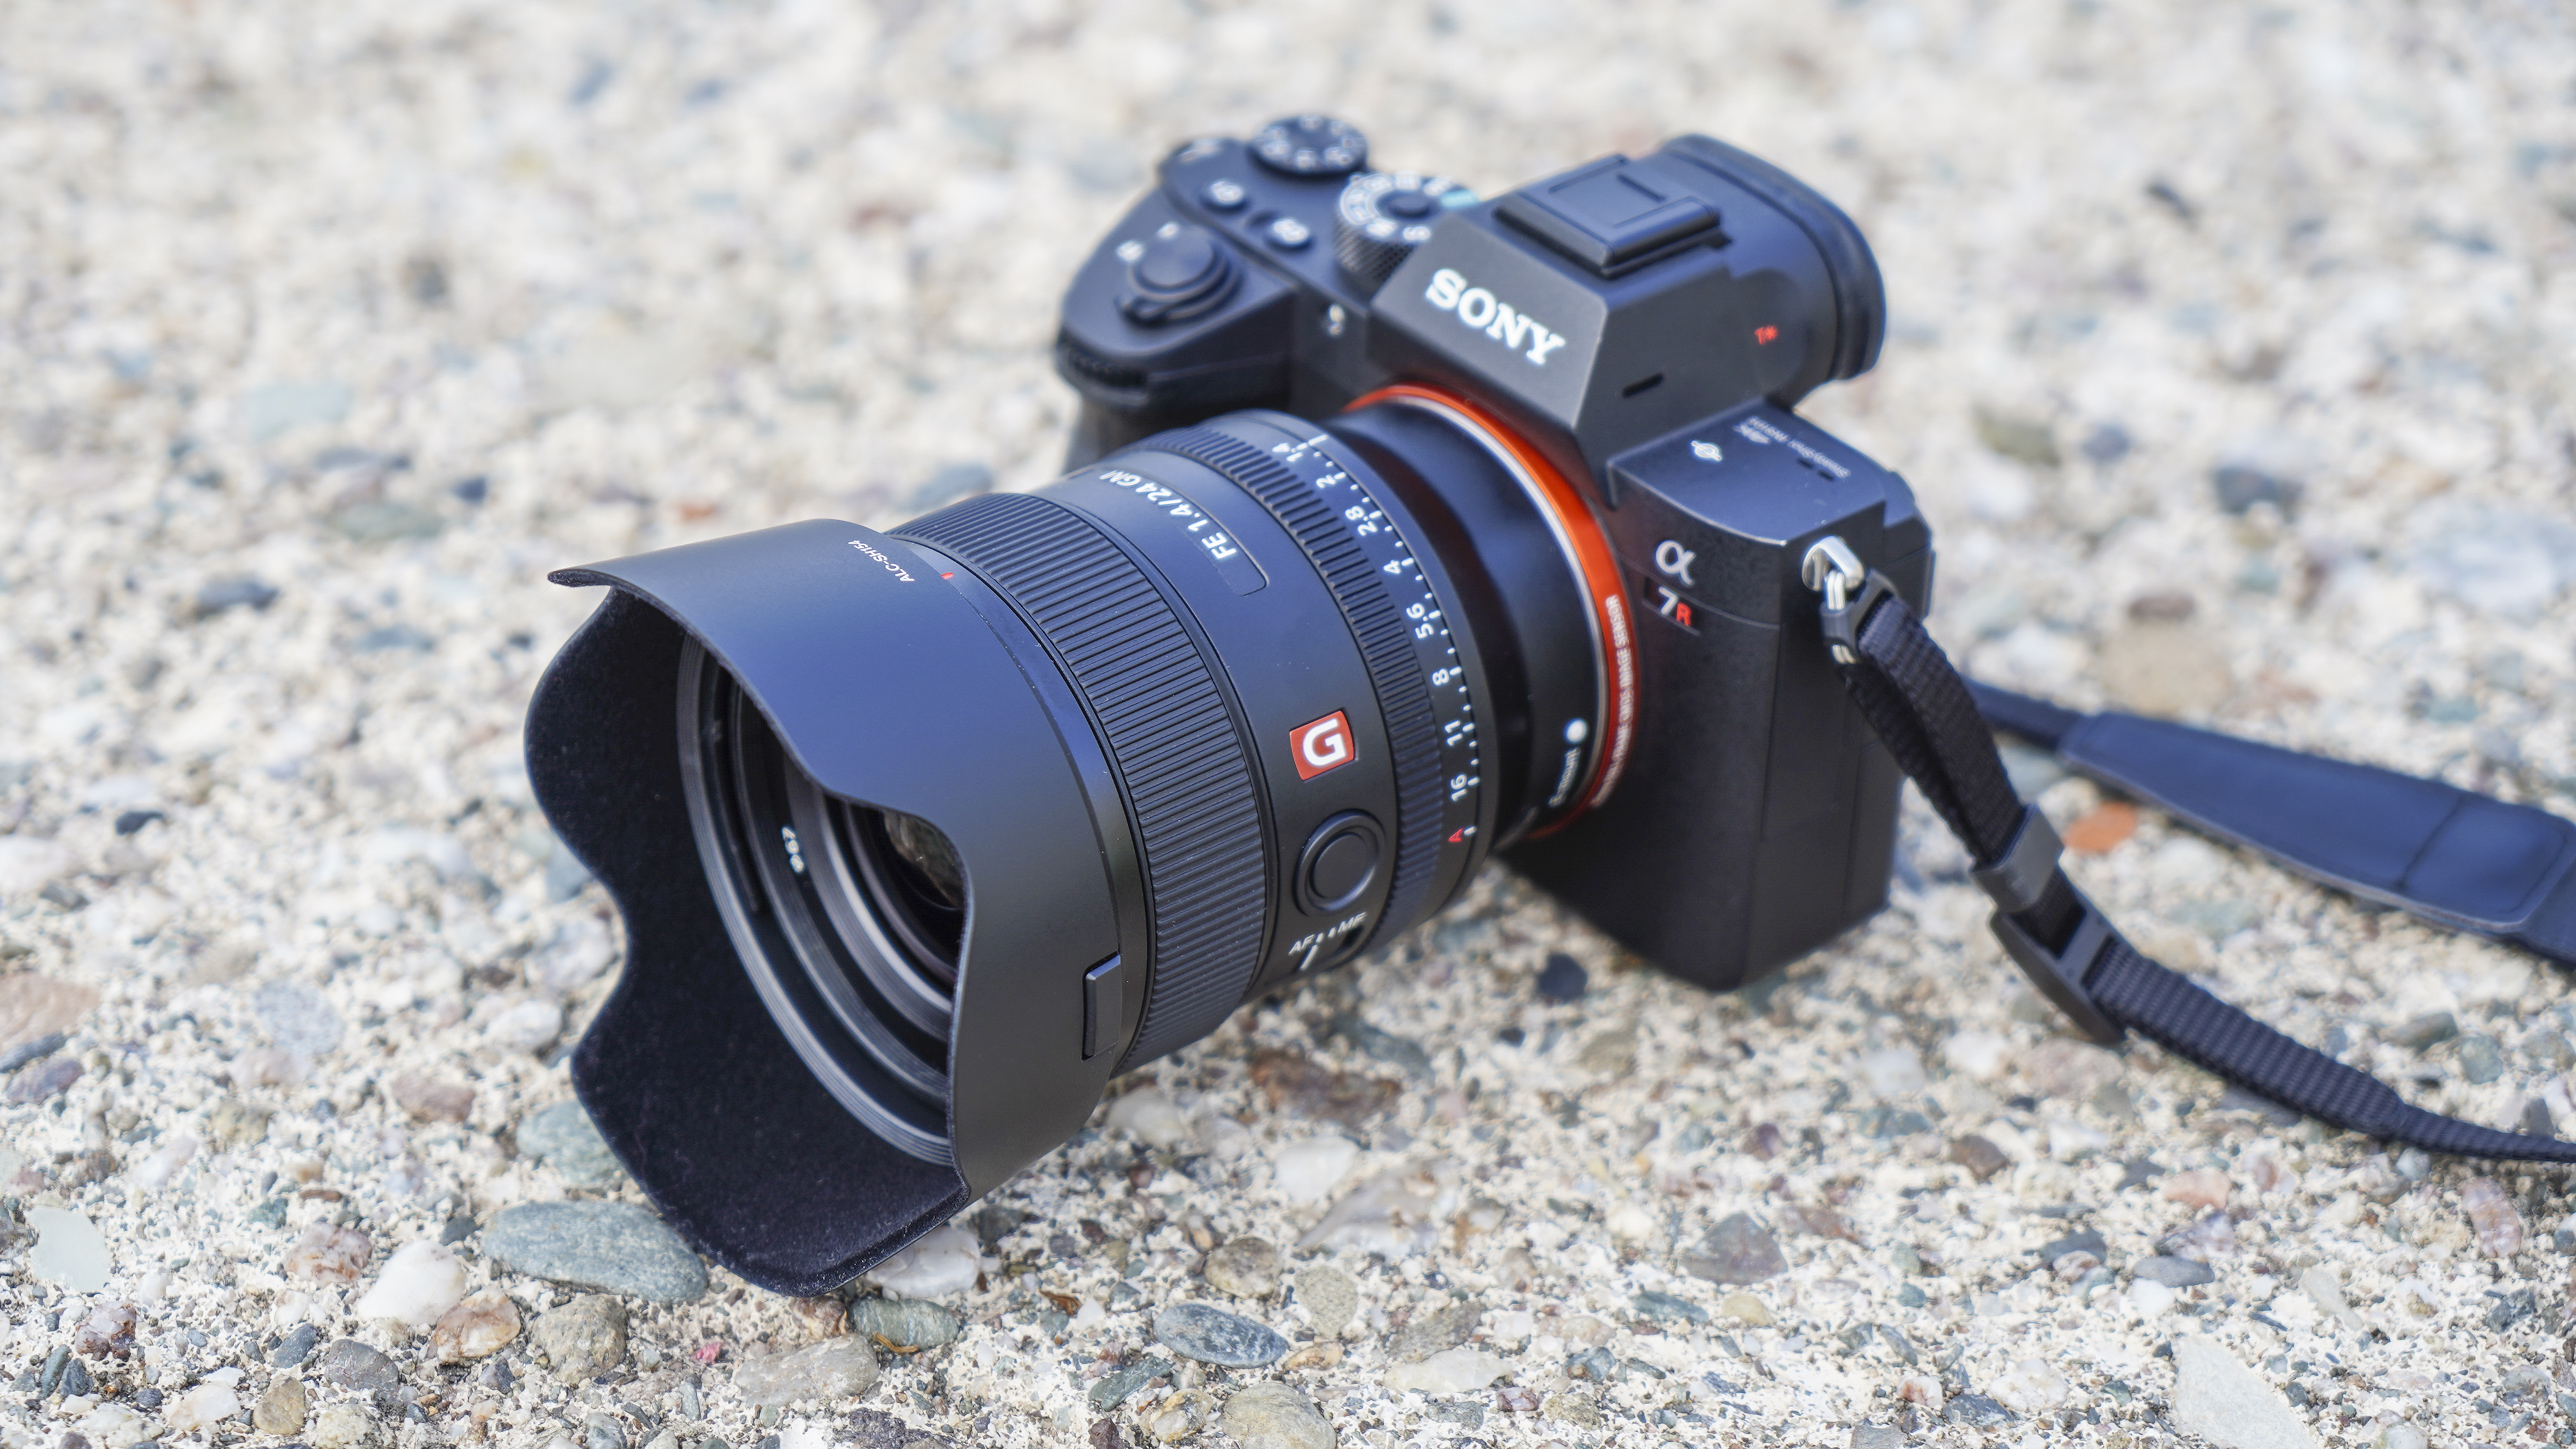 LXFtEKsgF8u9HM6QLUzUEP - The 10 best full-frame mirrorless cameras in 2019